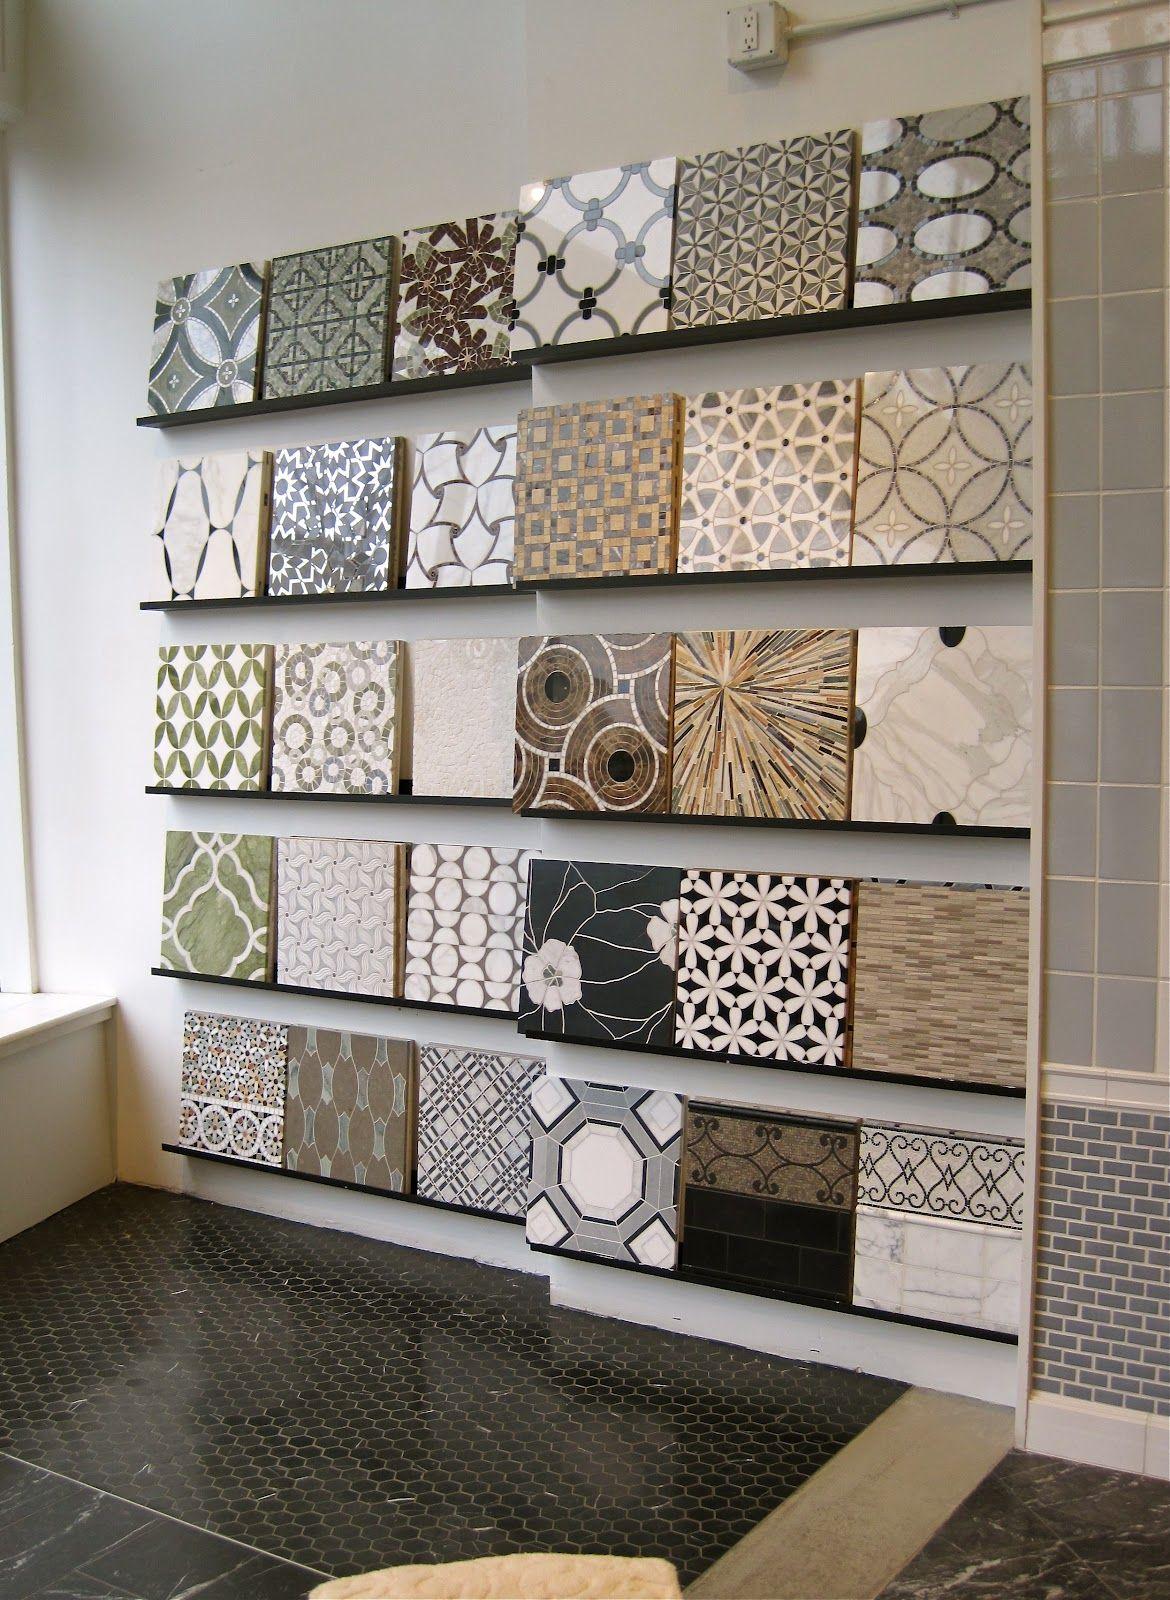 Images Ann Sacks Tile Courtney Lane Blog Field Trip To Designer